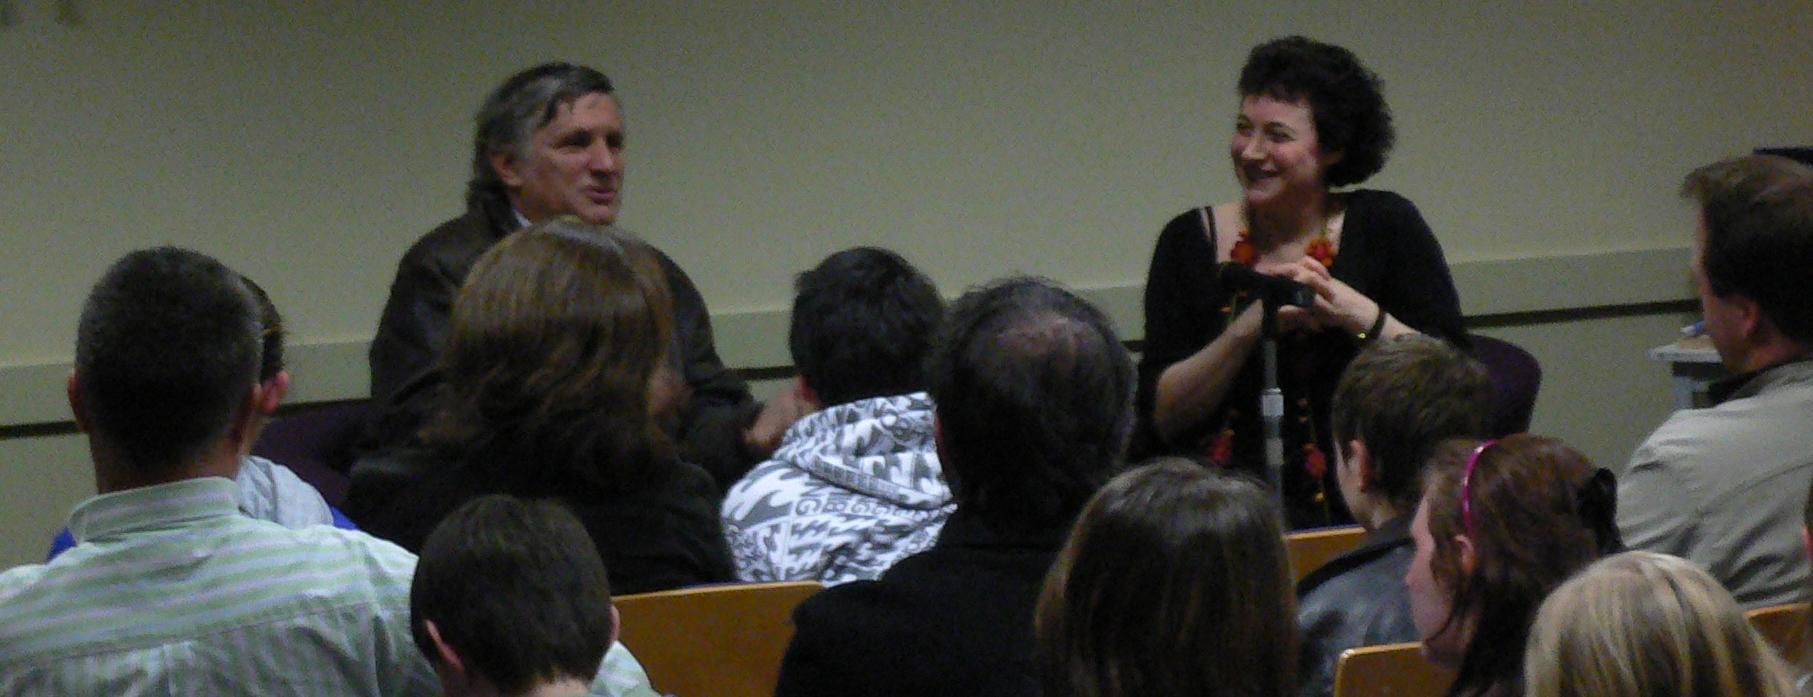 Library presentation with John Marsden